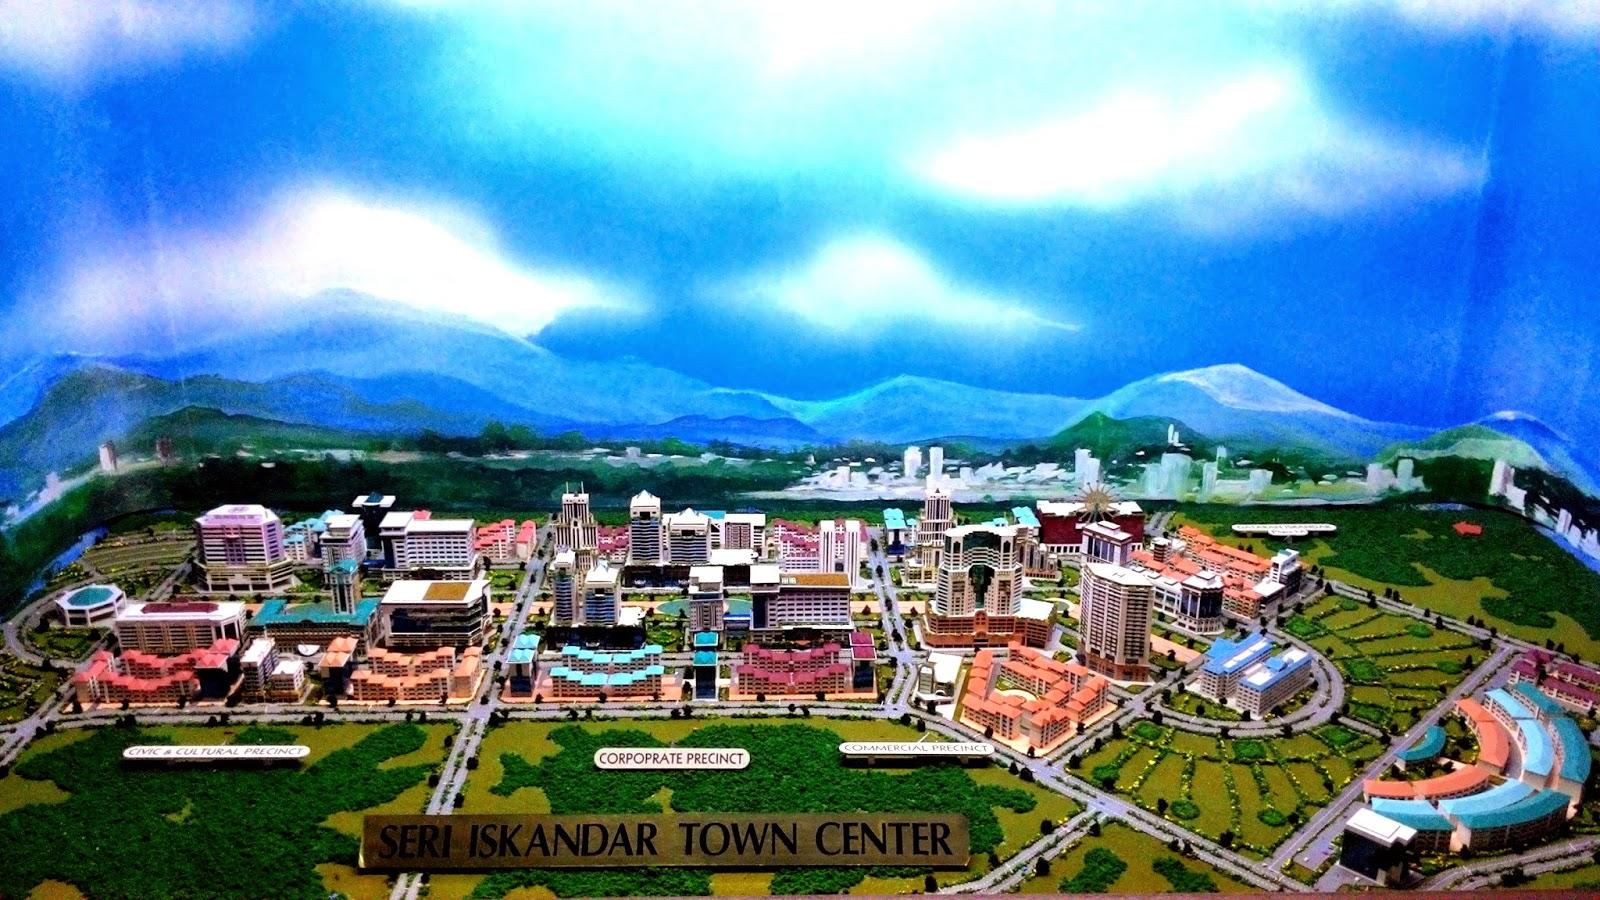 Terowong Sejarah Pasir Salak, Pusat Bandar Seri Iskandar